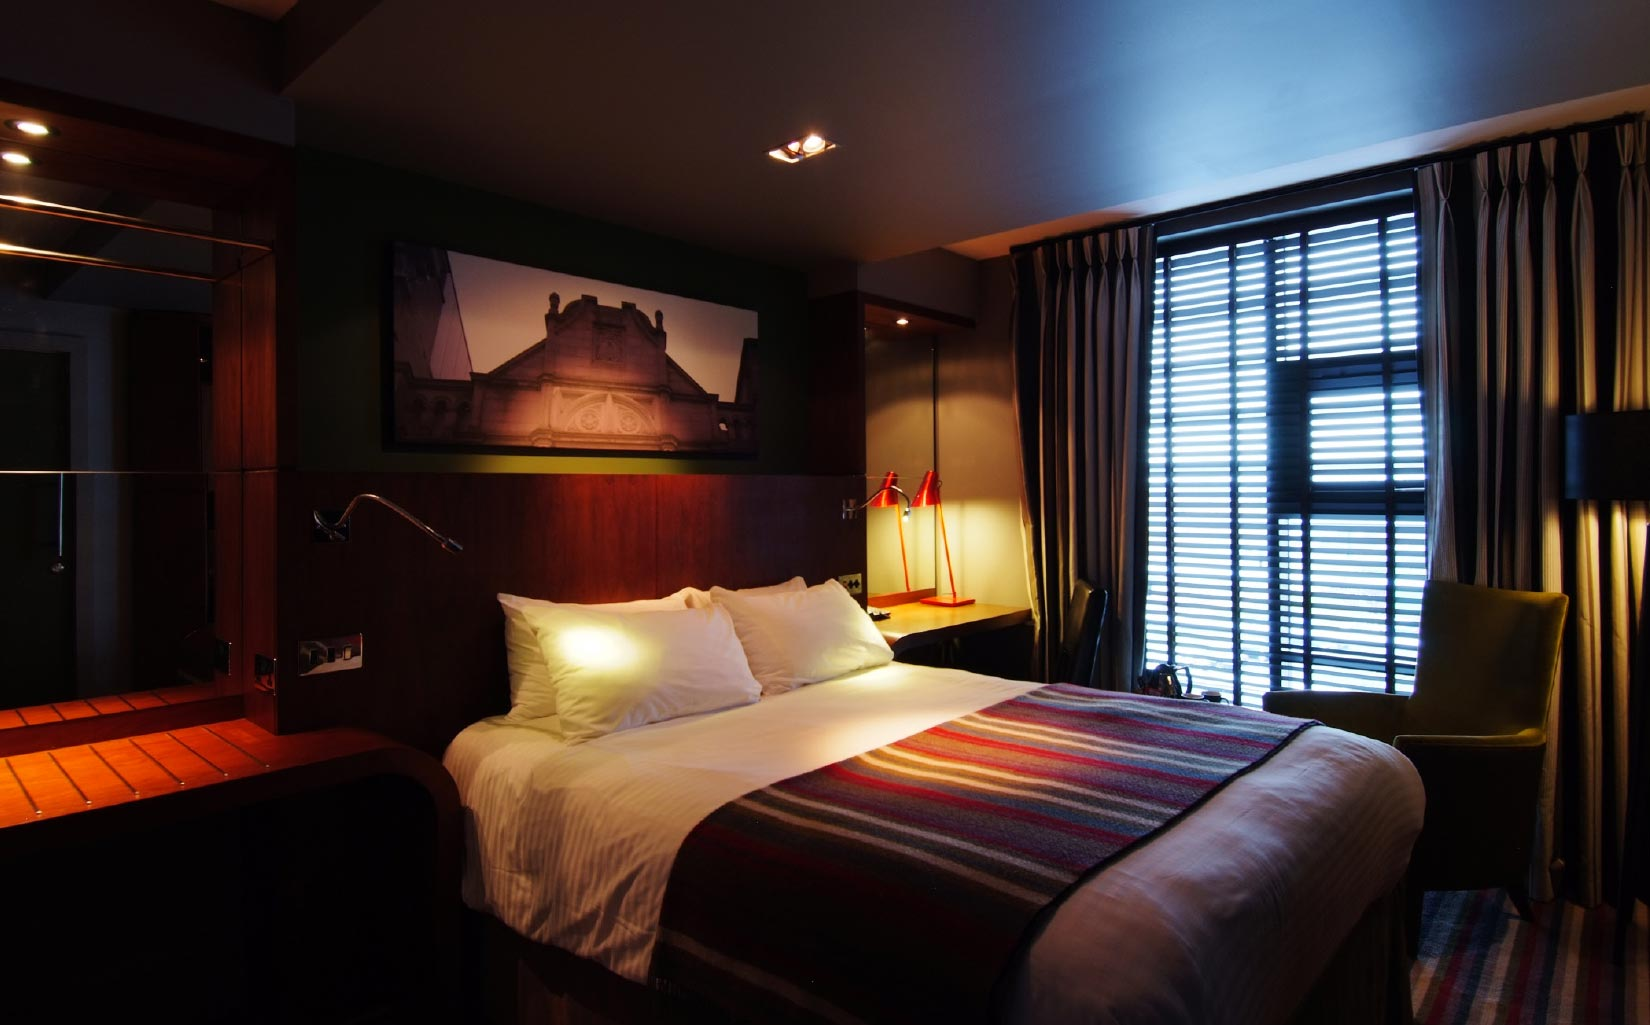 Village Hotel, Ashton Moss, Bedroom